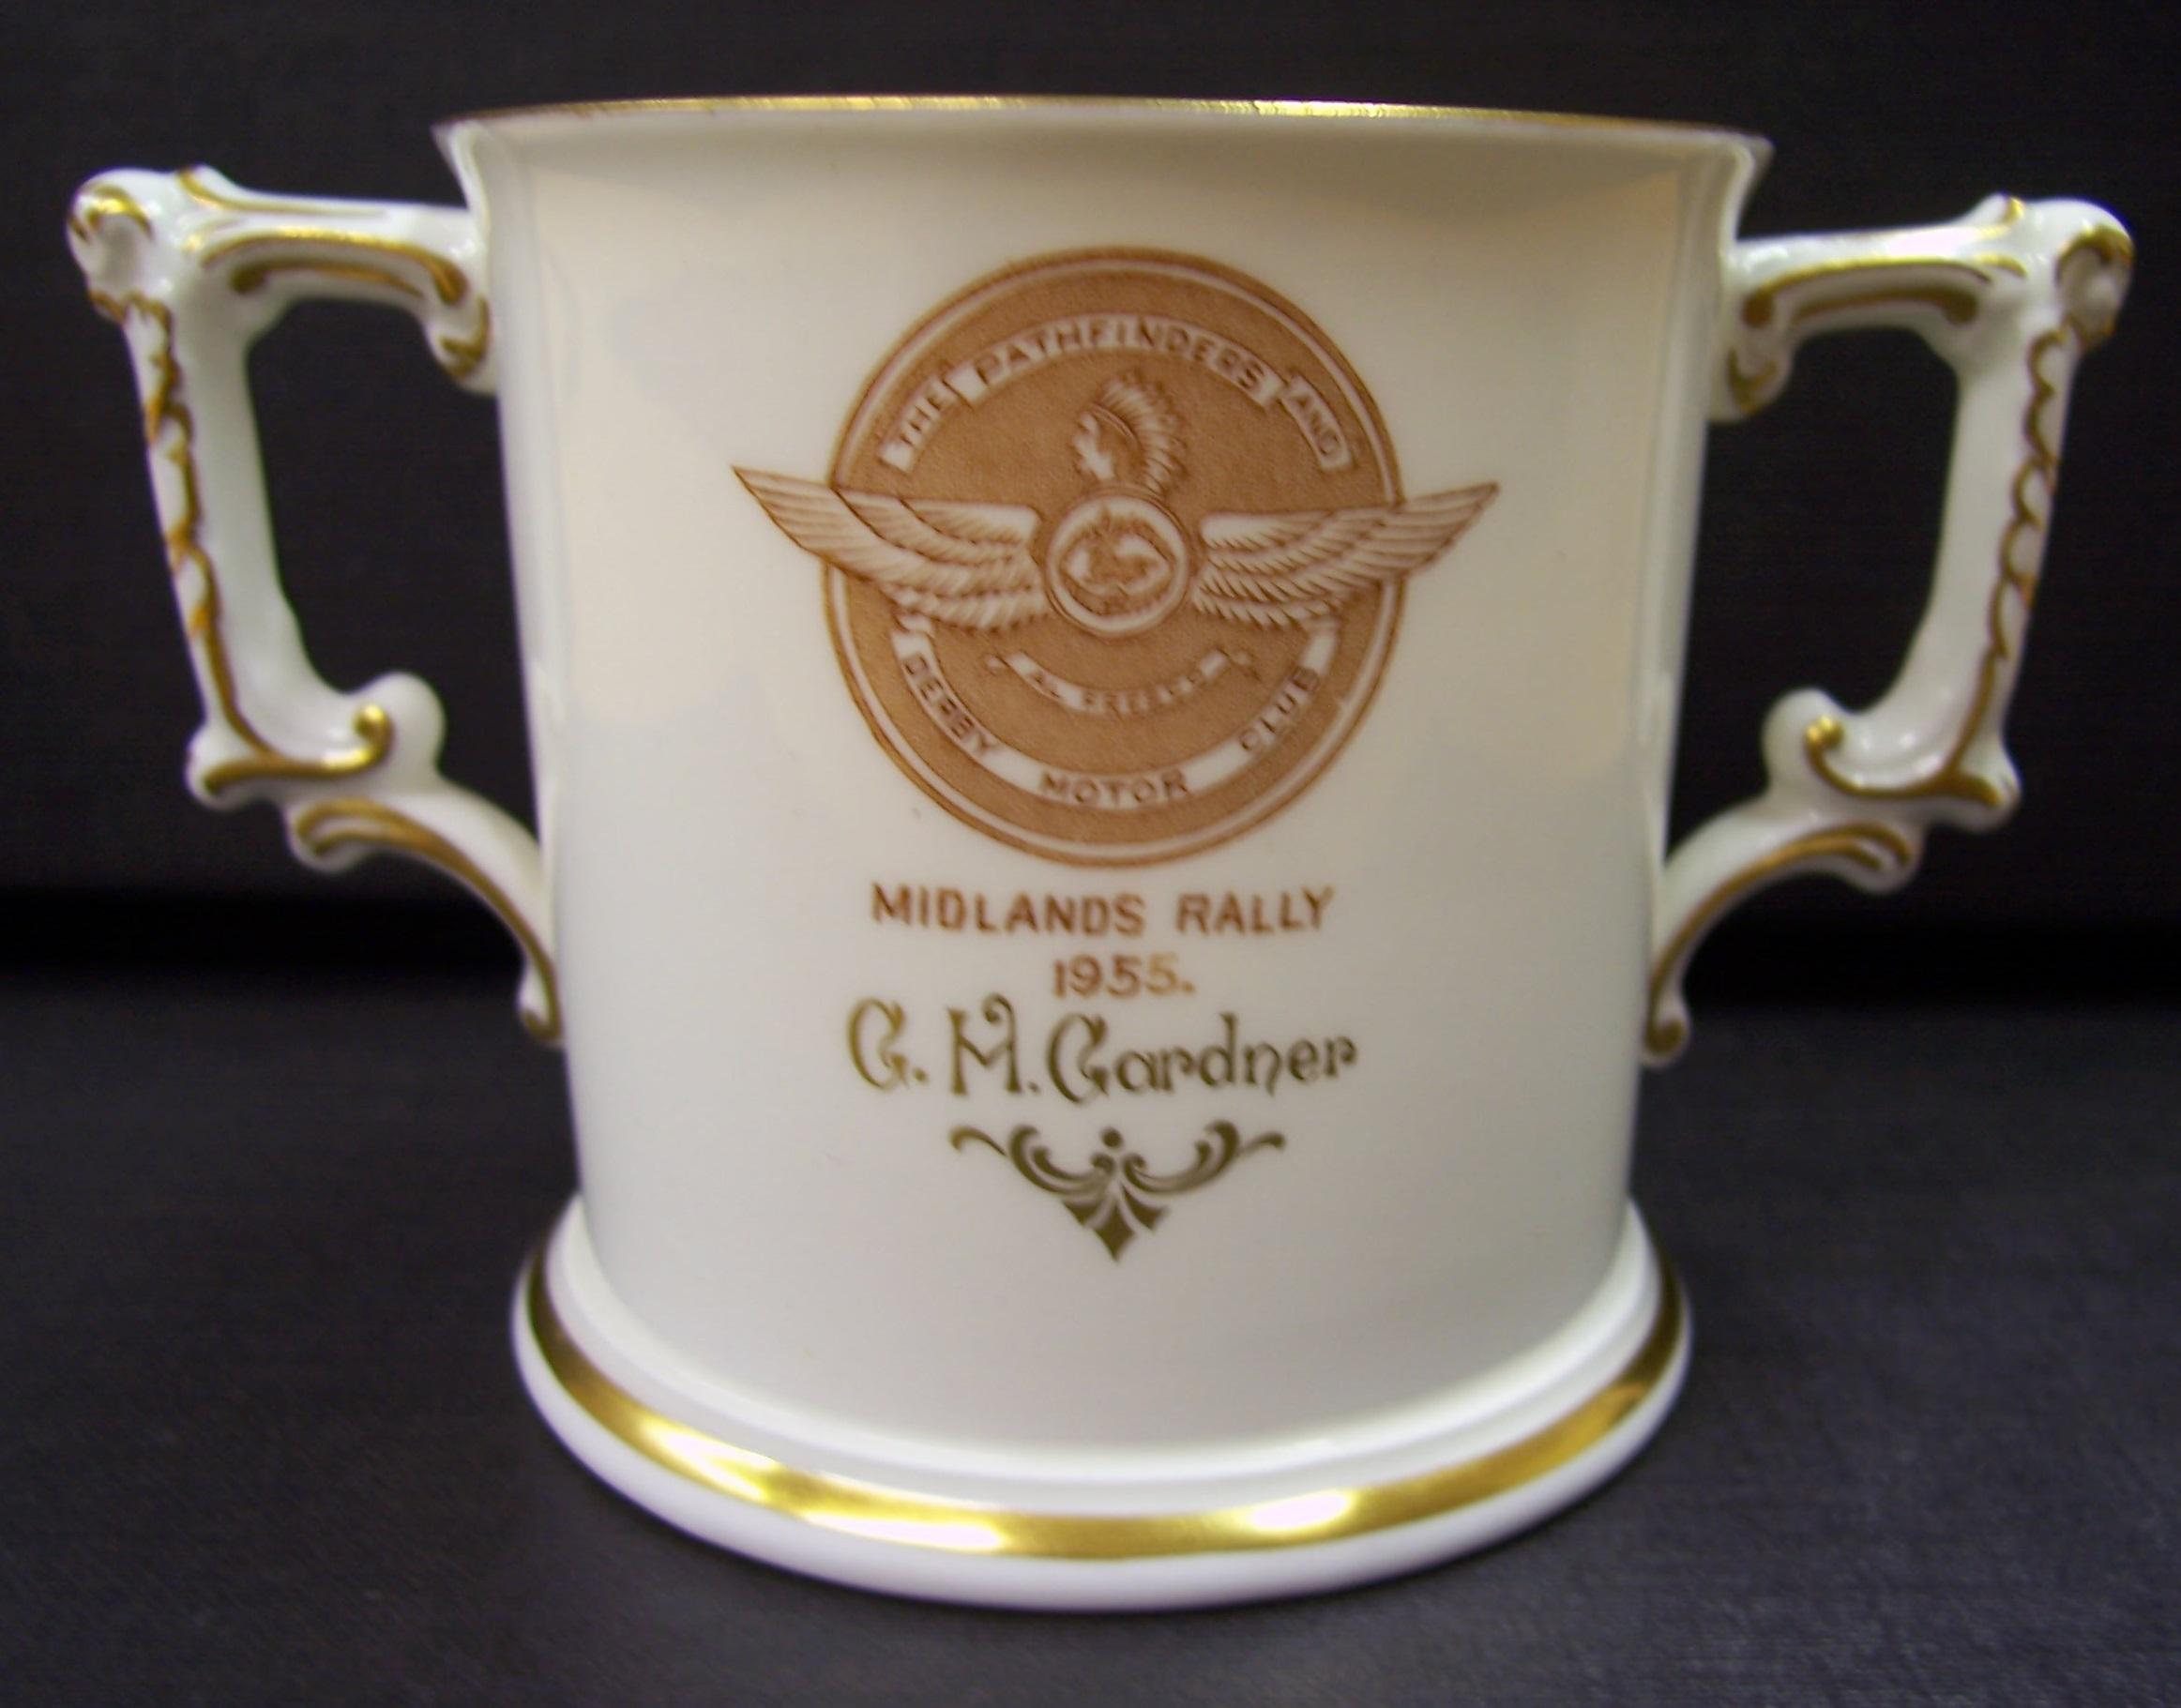 royal-crown-derby-loving-cup-derby-posie-the-pathfinders-and-derby-motor-club-midlands-rally-g-m-gardner-1955-A228-reverse